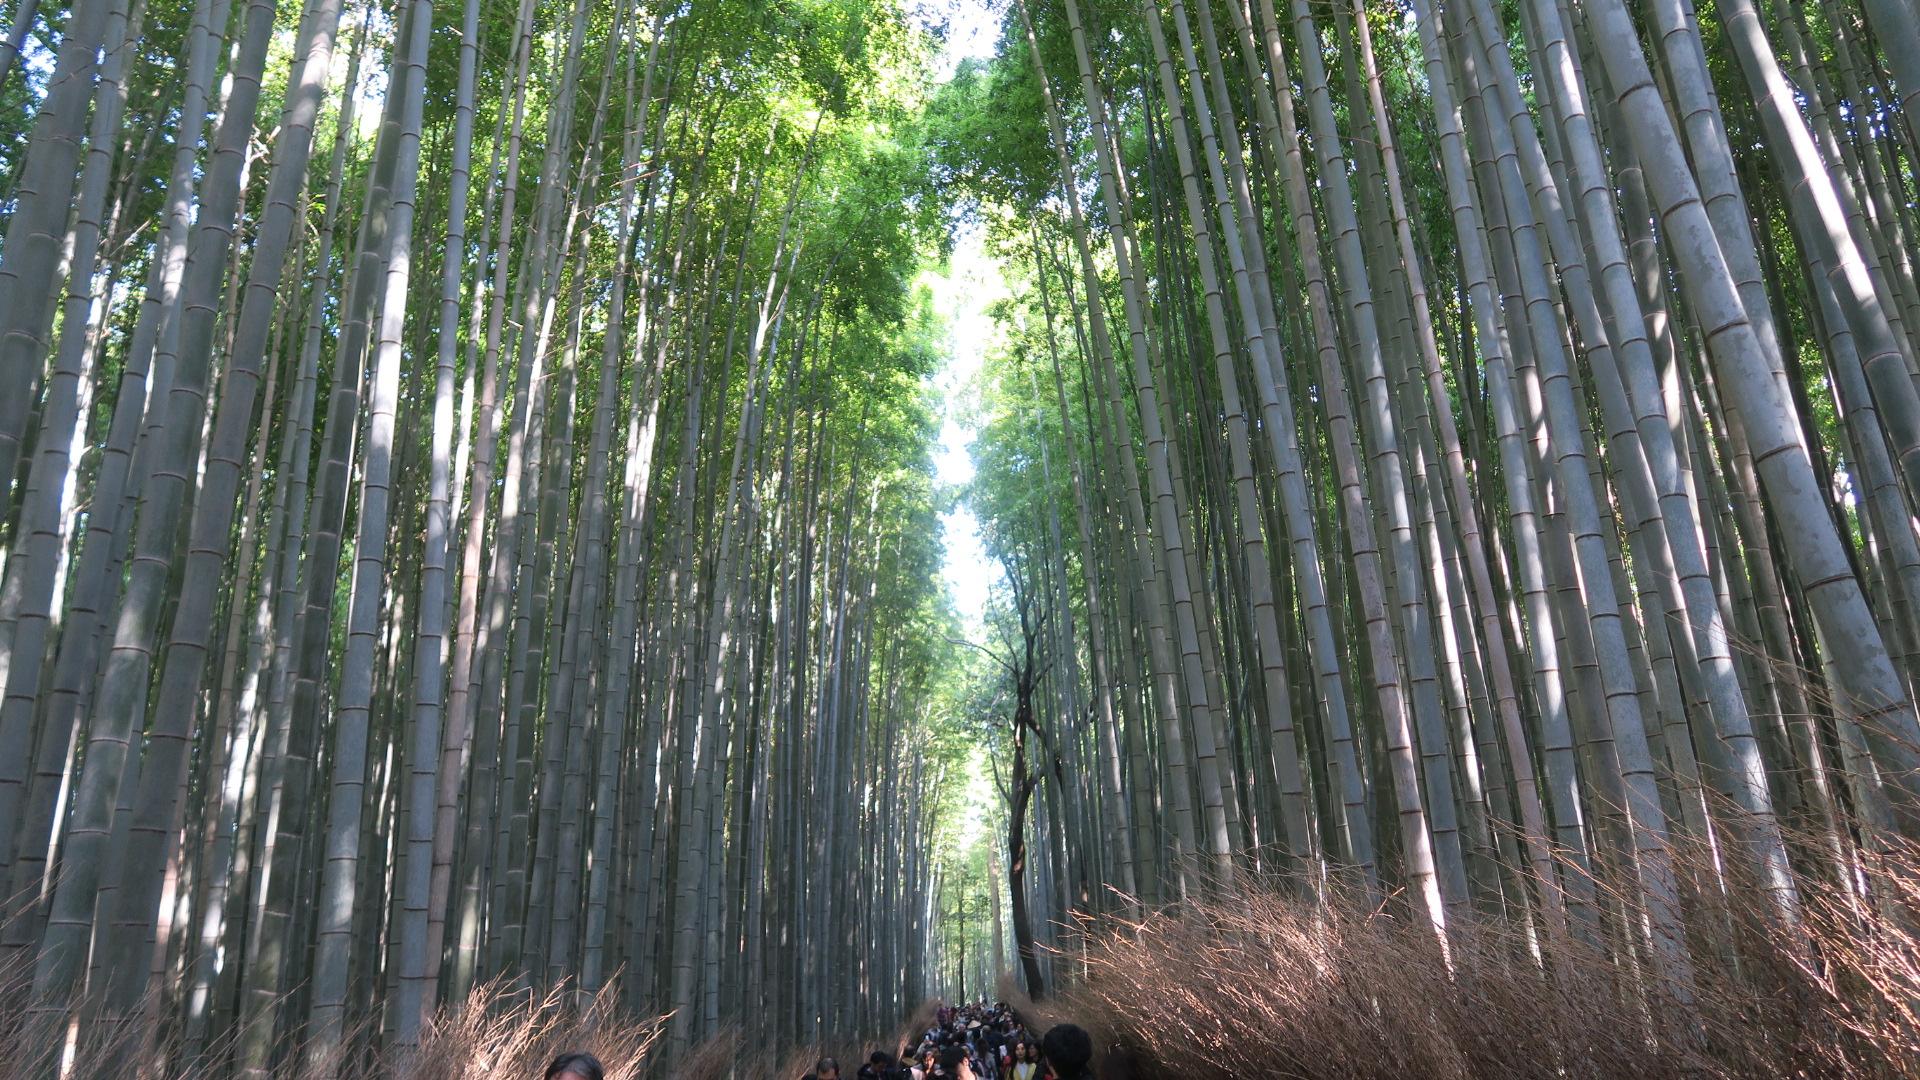 Chikuri-no-mori (Bamboo Forest)